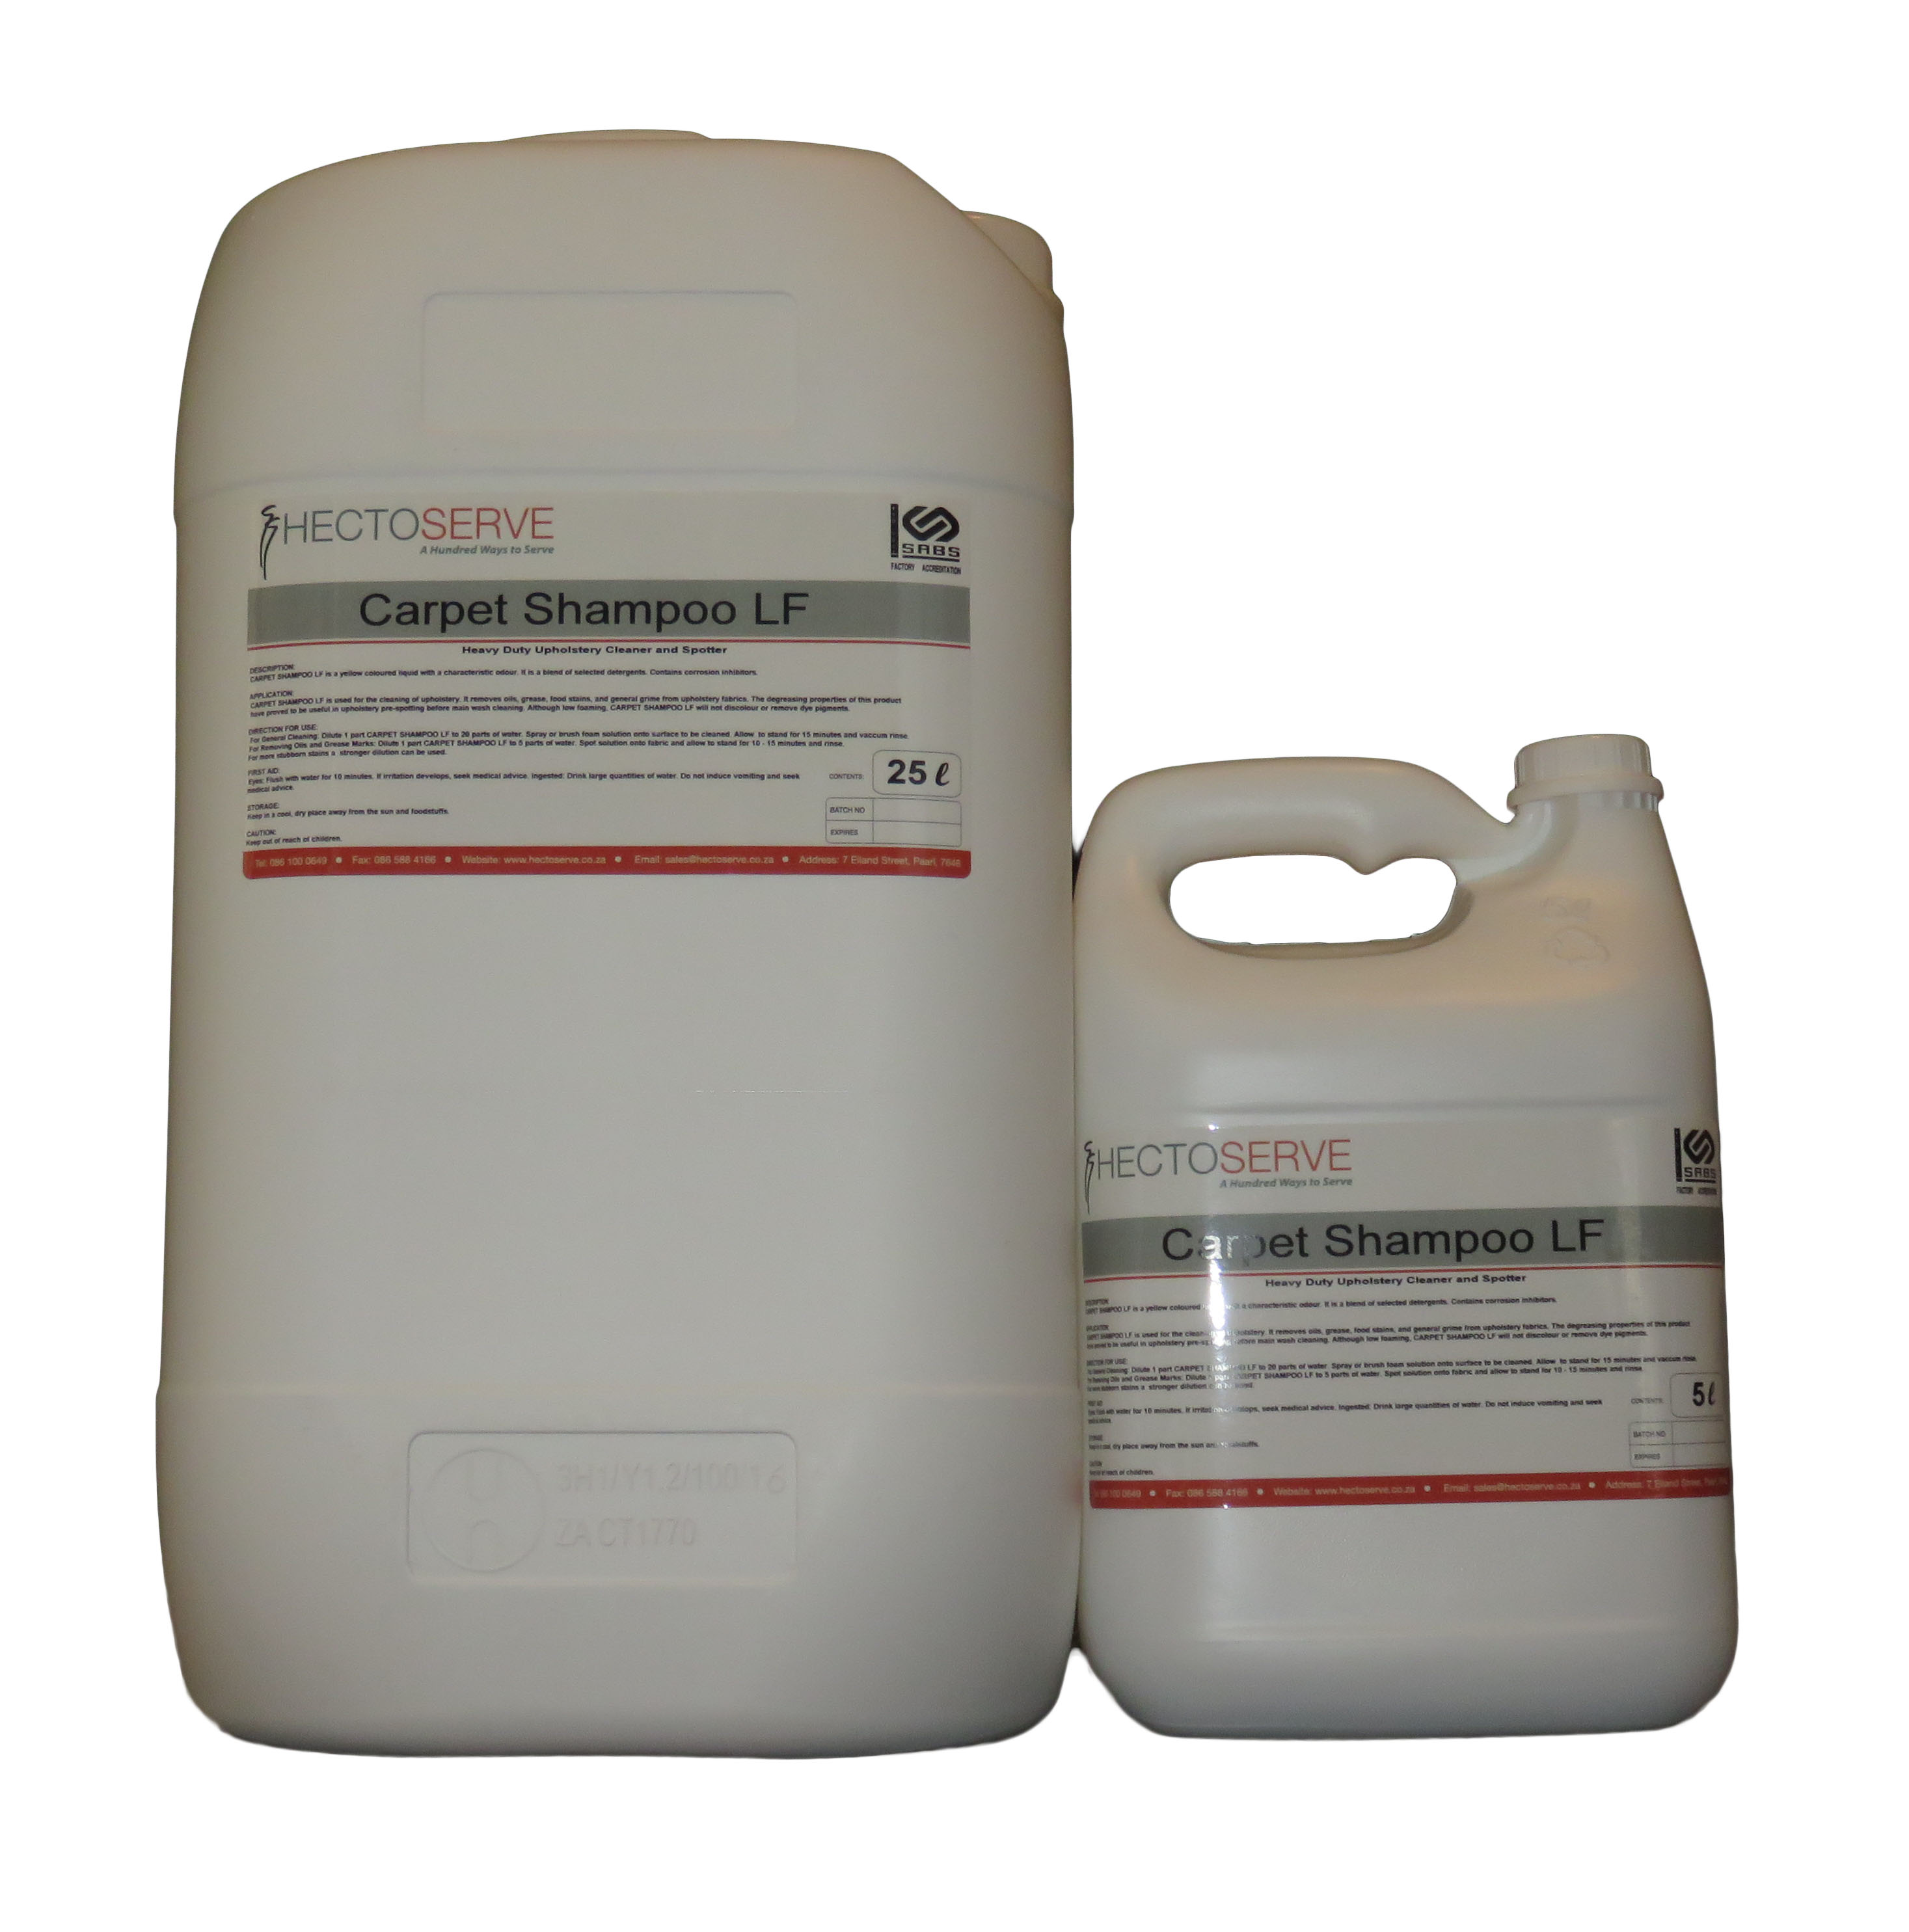 Hectoserve Carpet Shampoo Low Foam